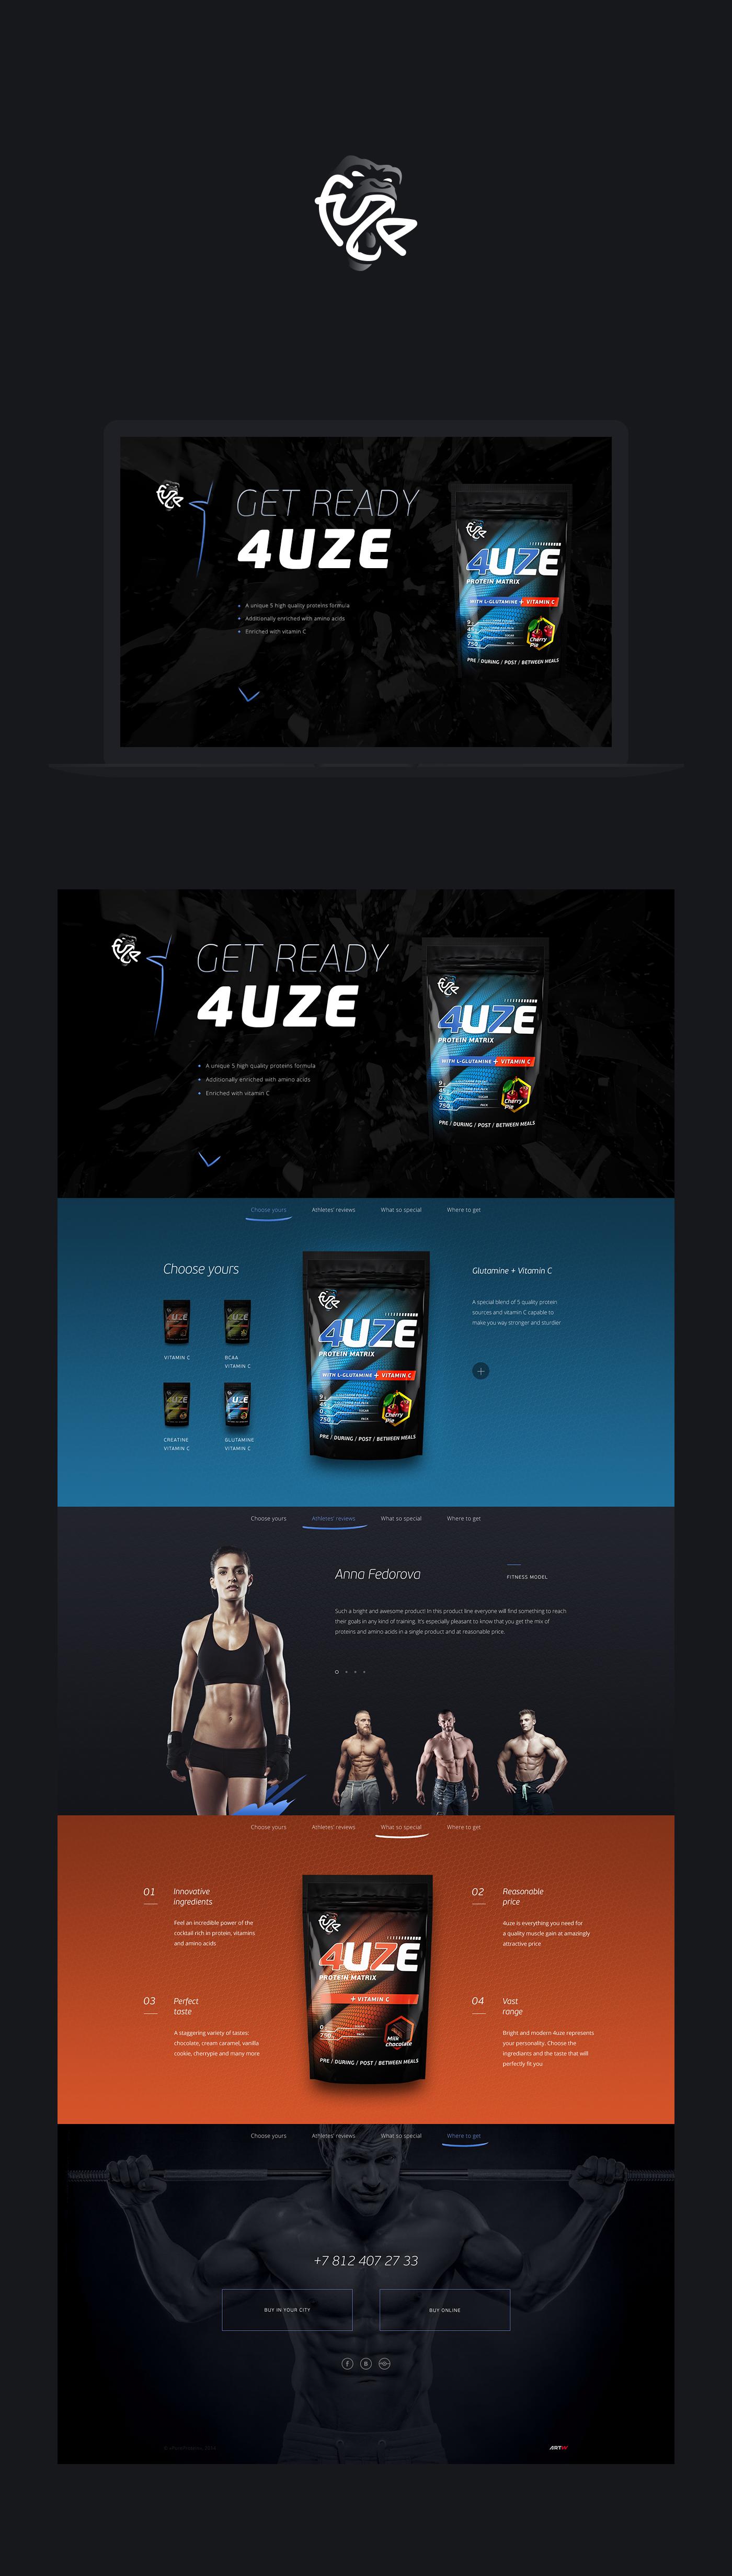 sport nutrition gym muscle black blue energy power girl strong promo Website loud BodyBuilding landing